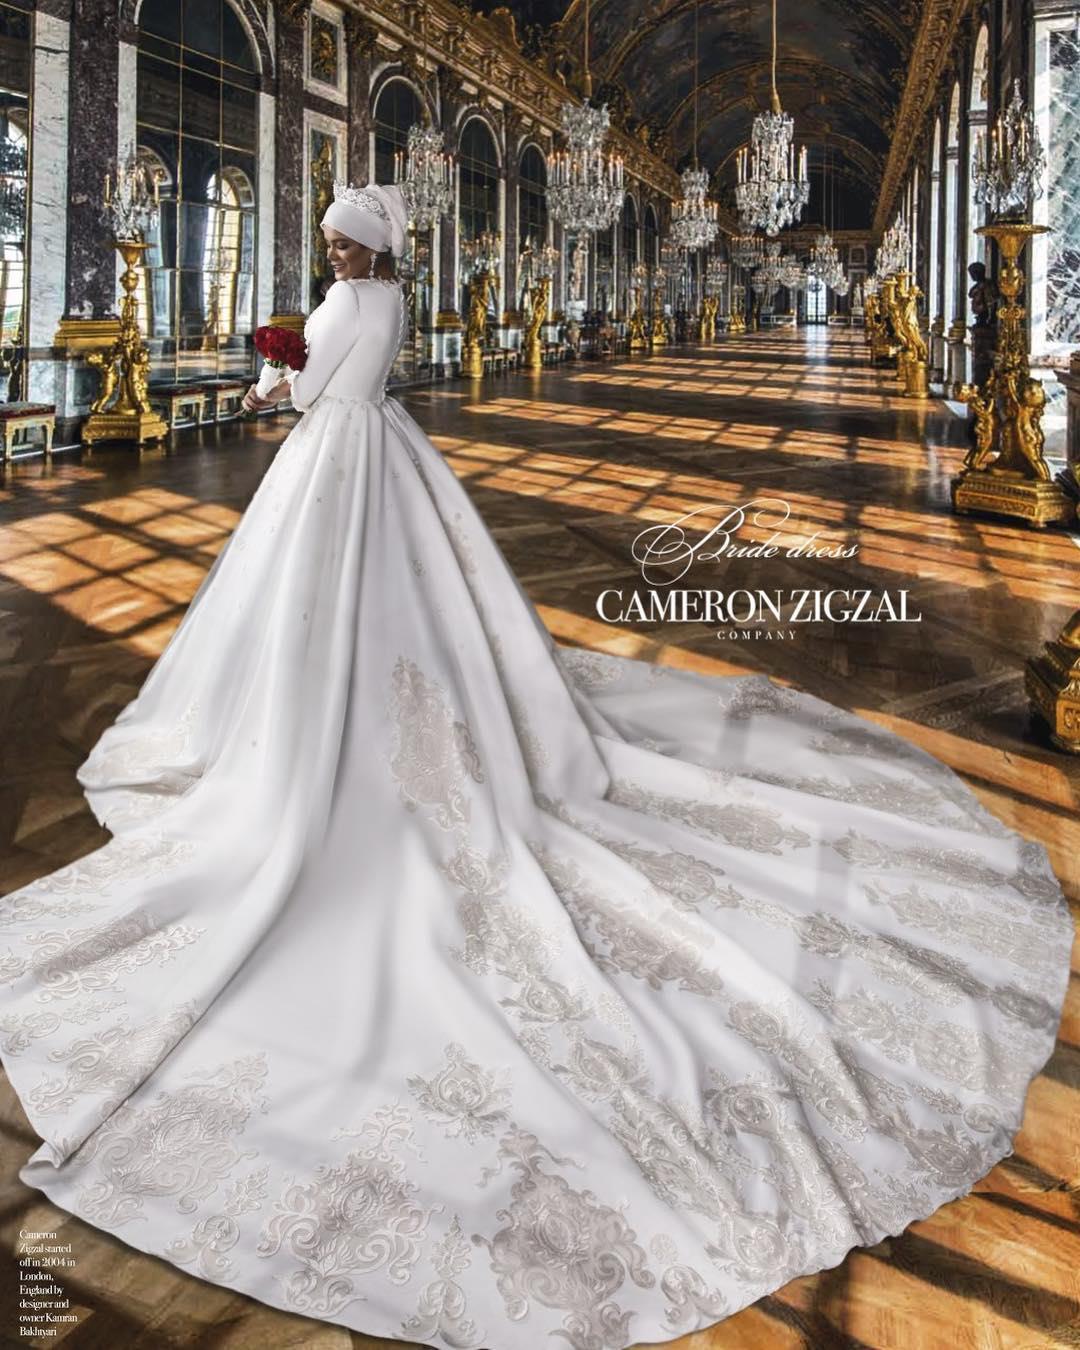 Cameronzigzal's wedding Gown✨